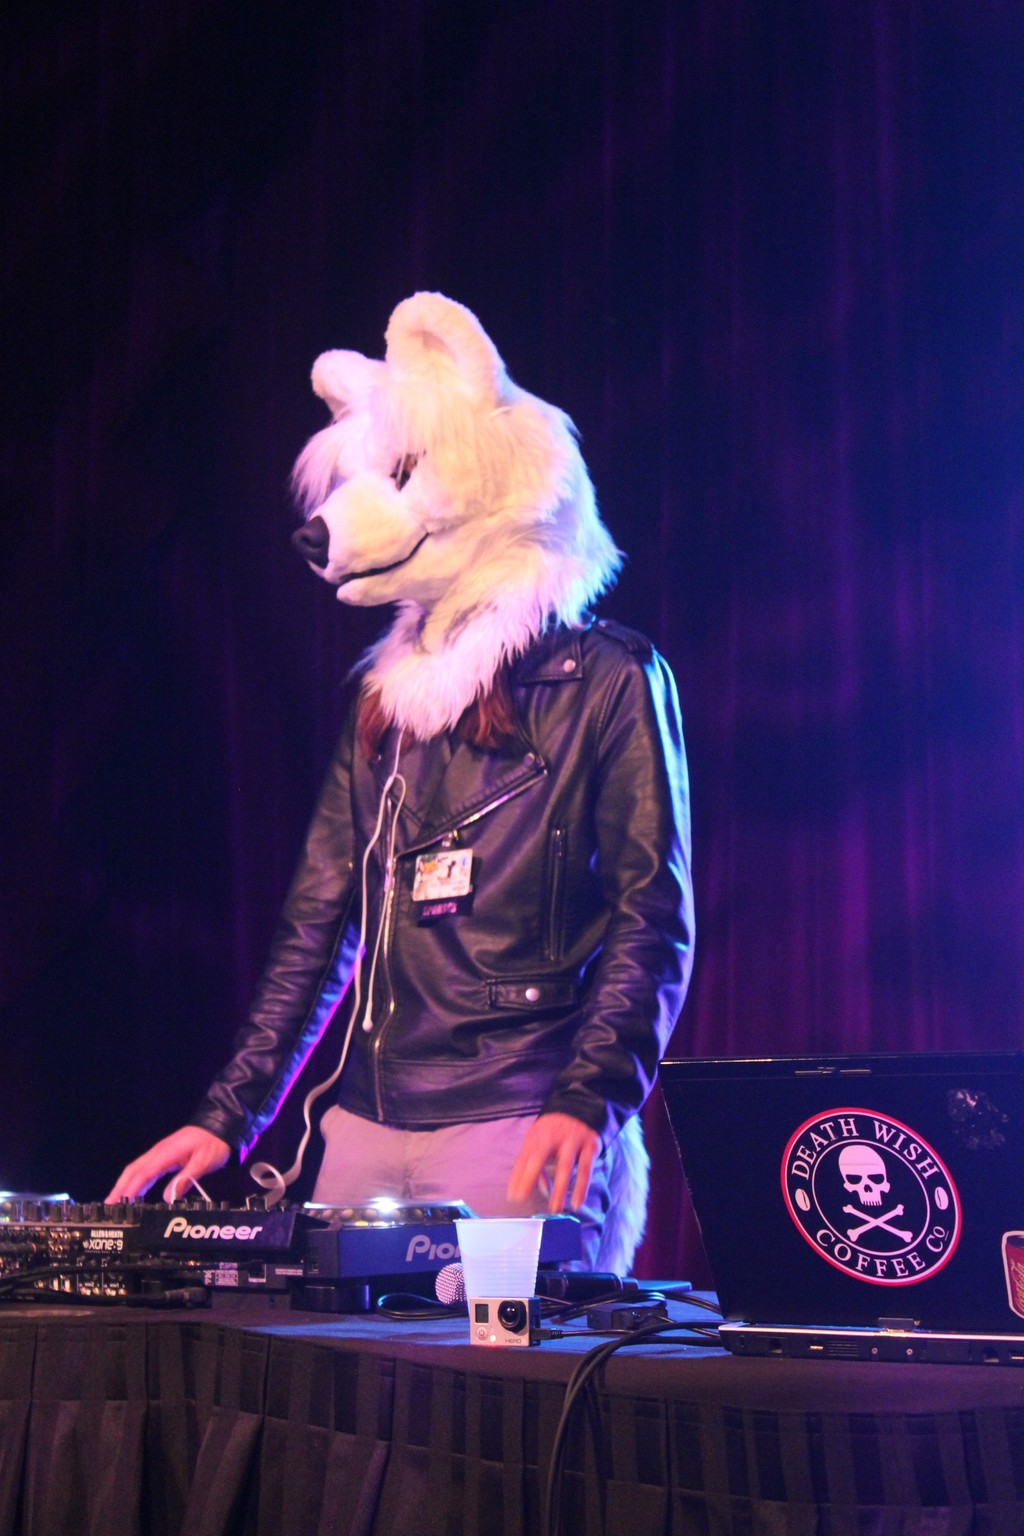 Texas Furry Fiesta 2016 - Sebris' DJ performance